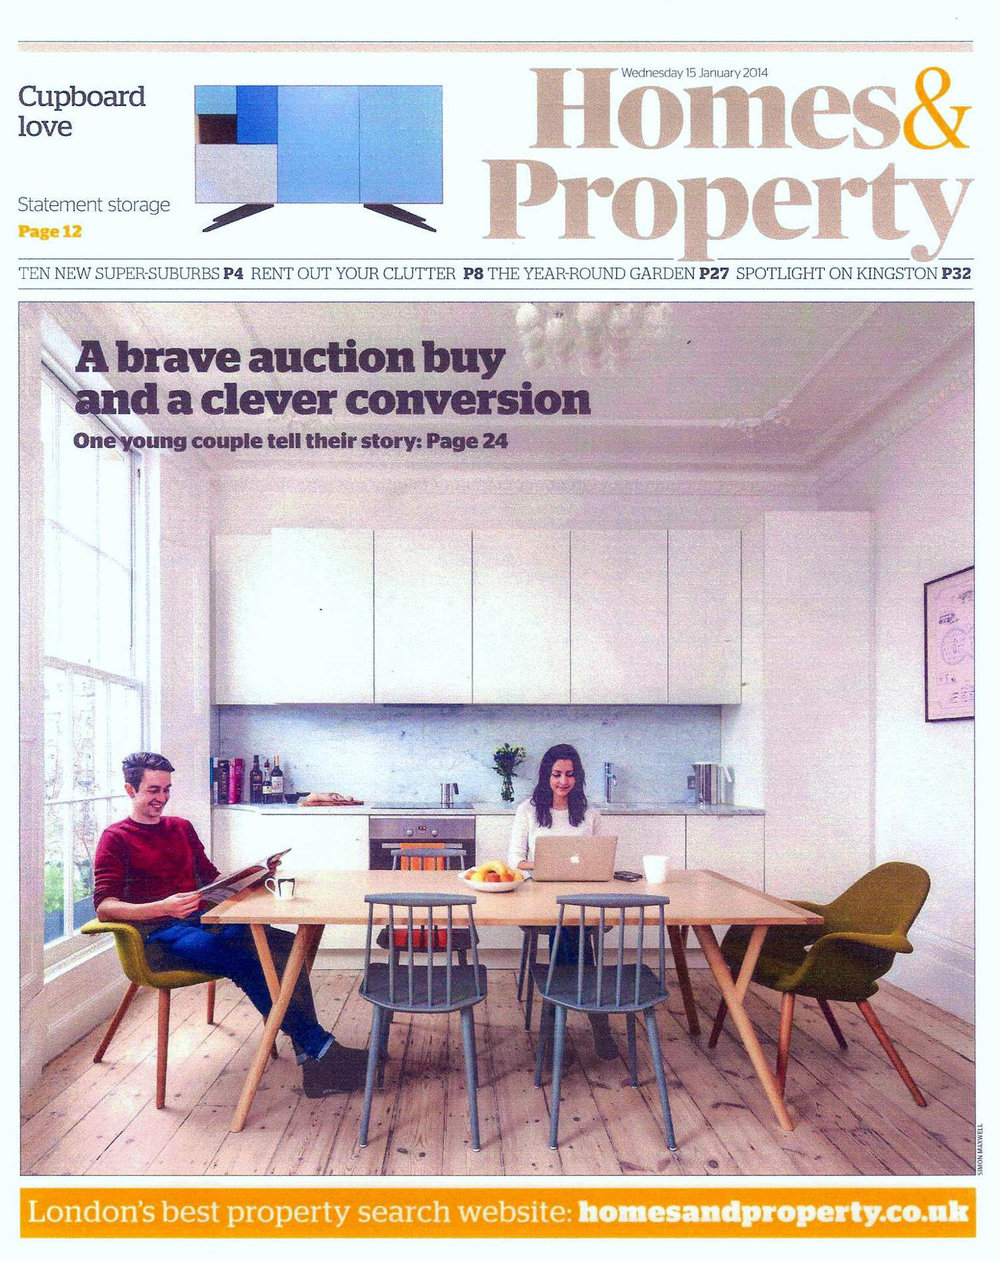 Evening Standard Cover.jpg